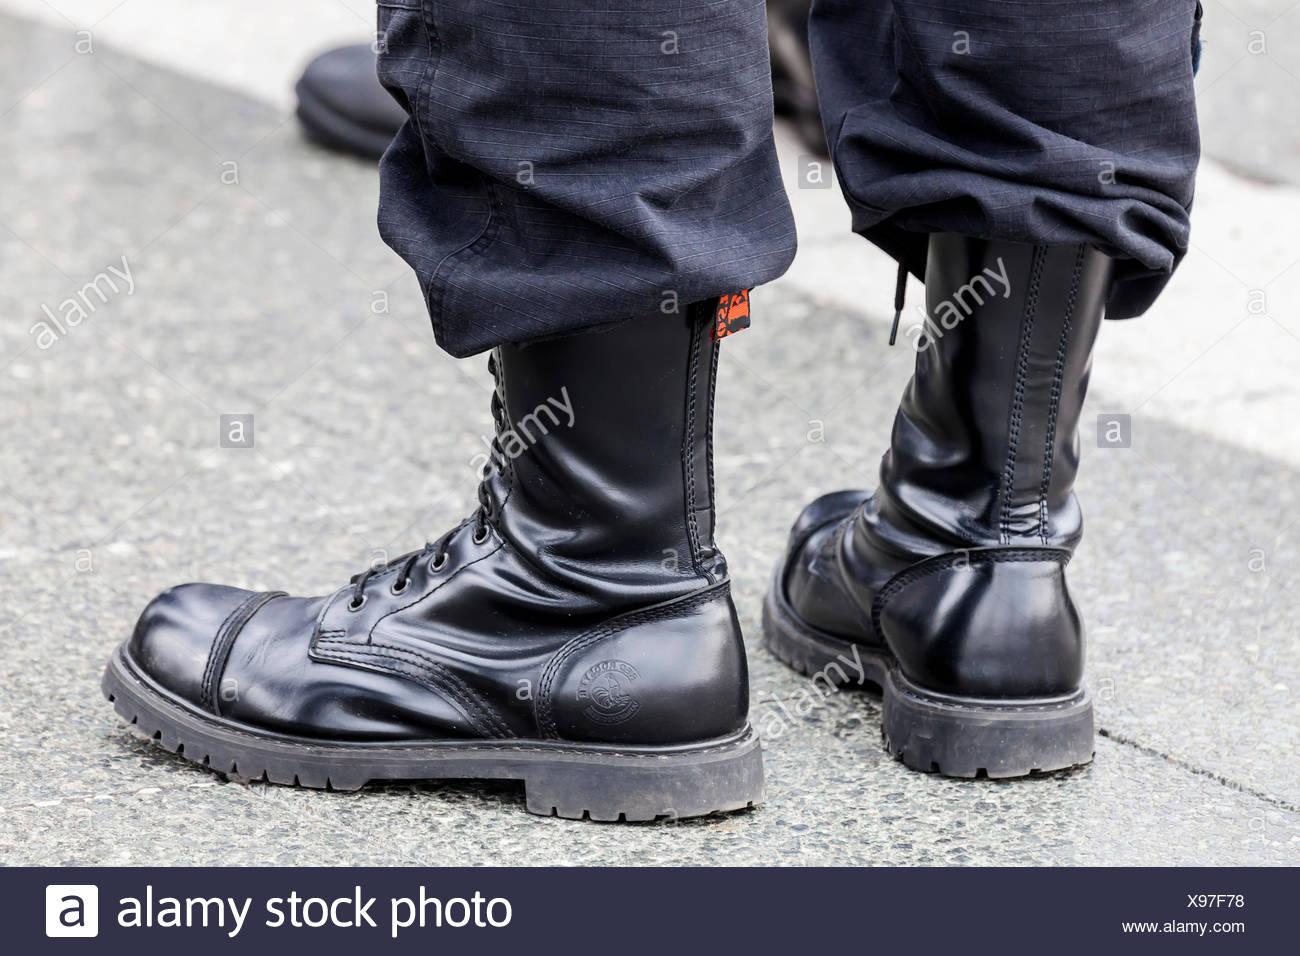 Combat Boots Nazi Stockfotos & Combat Boots Nazi Bilder Alamy